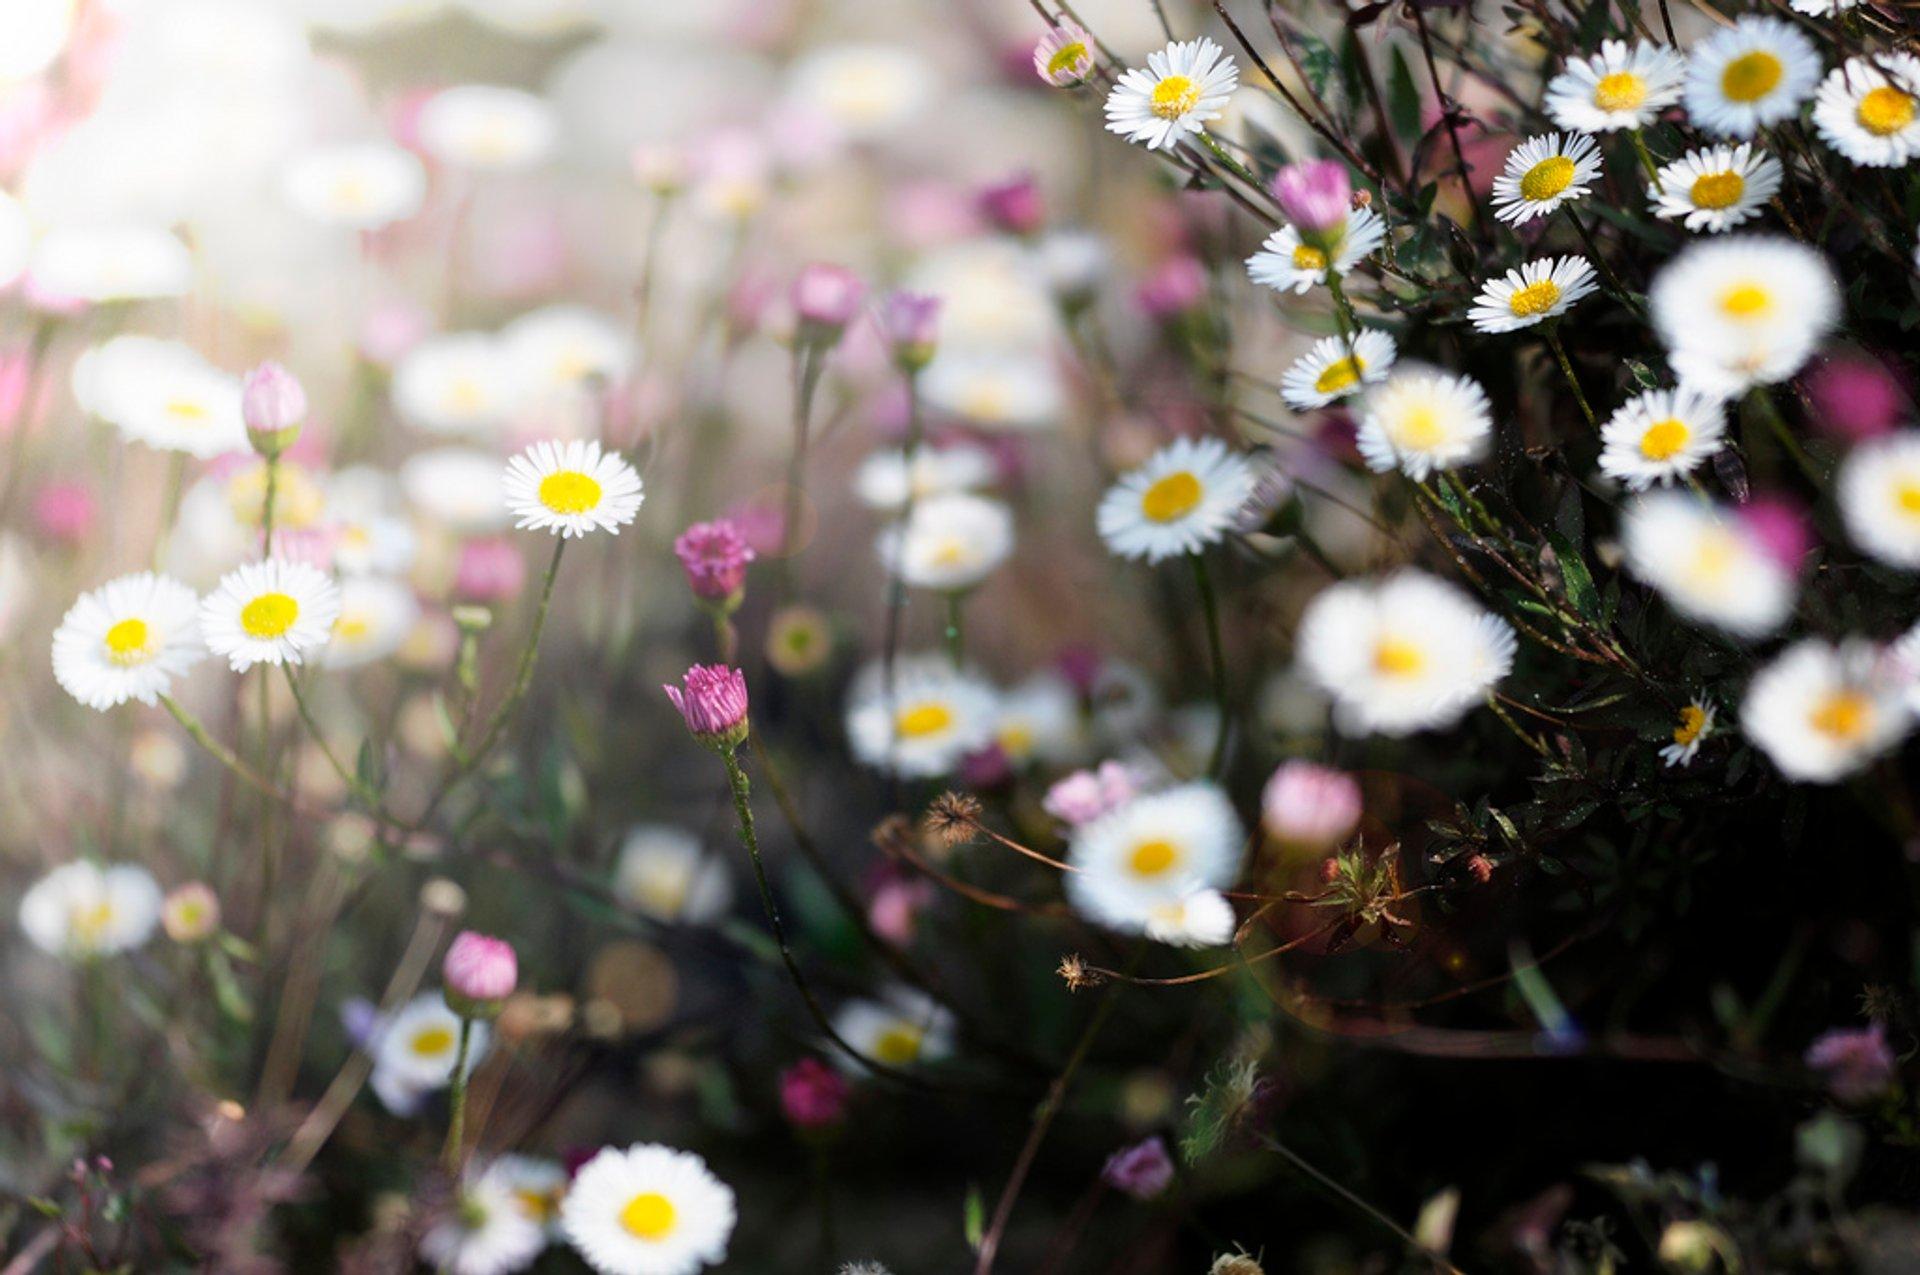 Ticino Flower Fields in Switzerland 2020 - Best Time